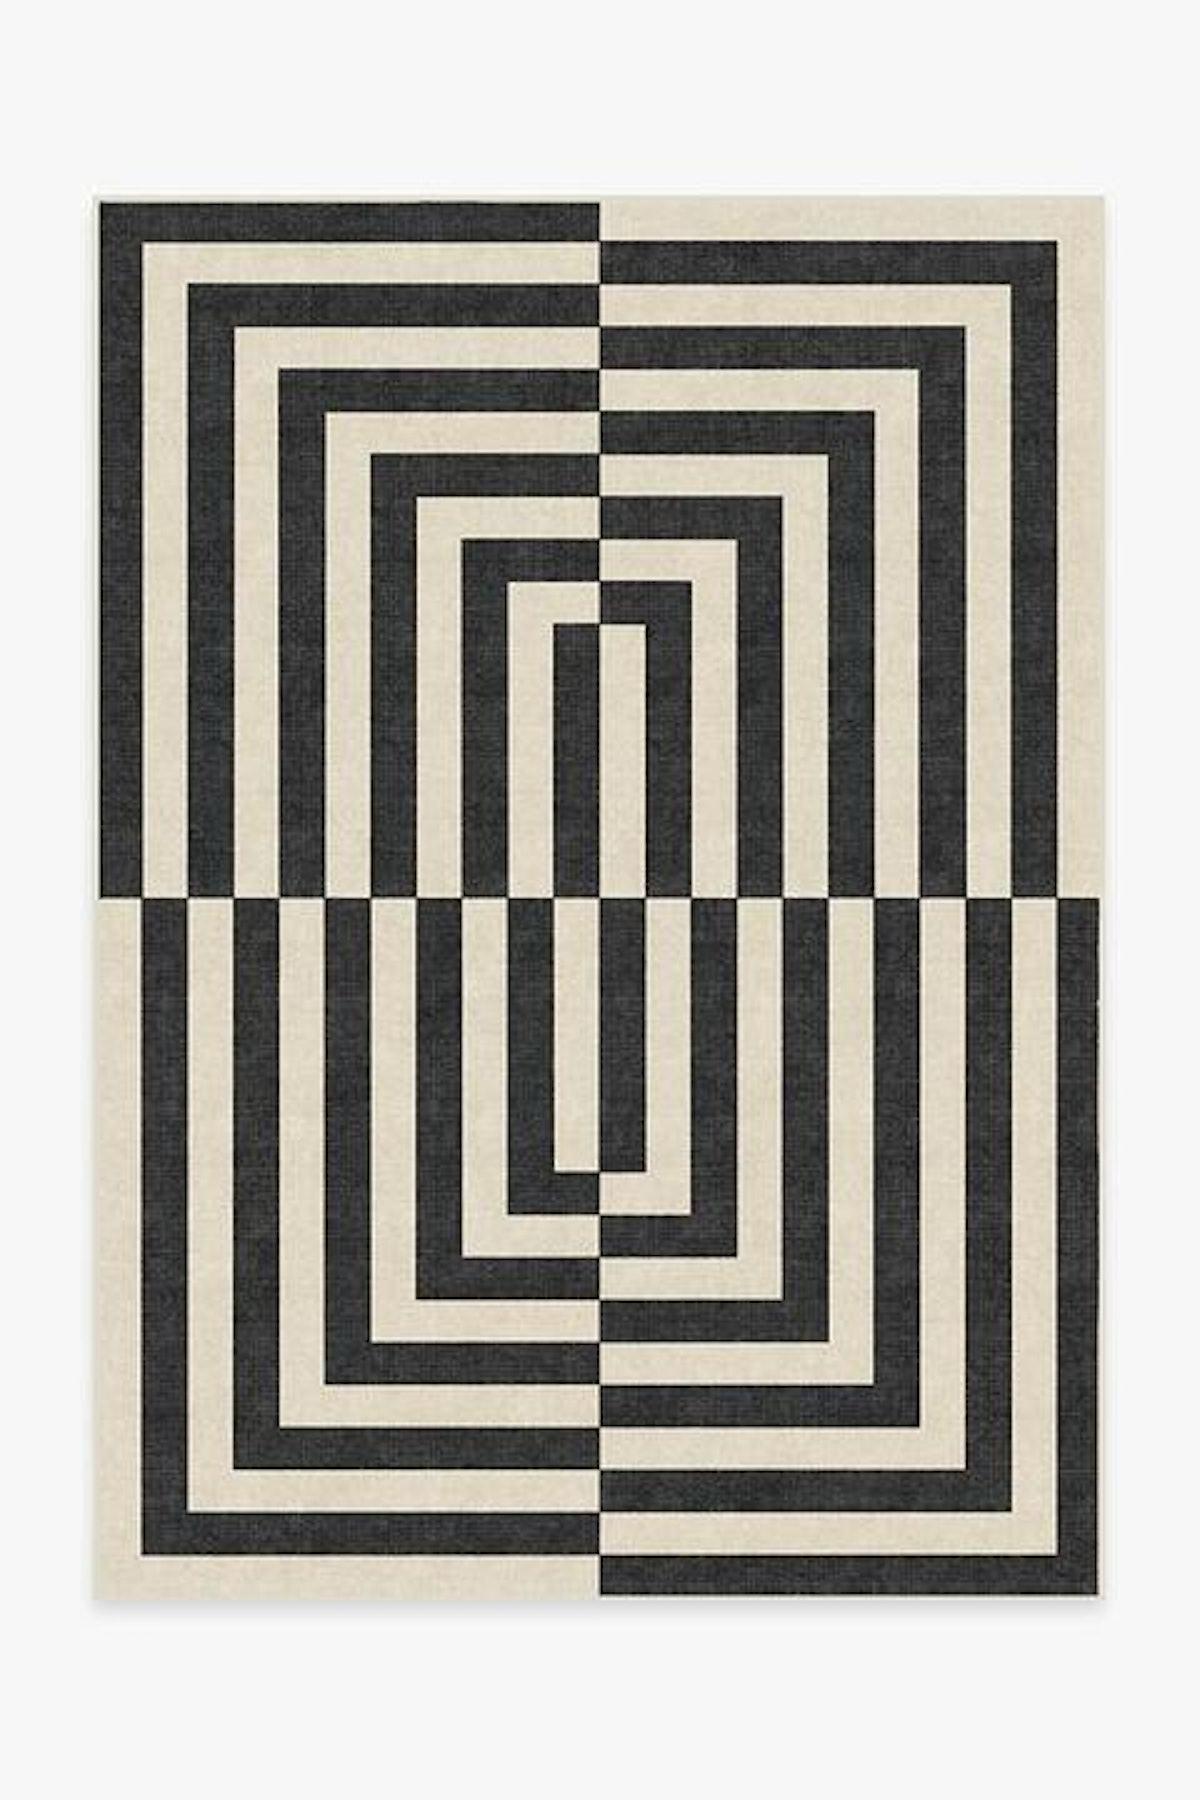 Jonathan Adler Op Art Charcoal Rug